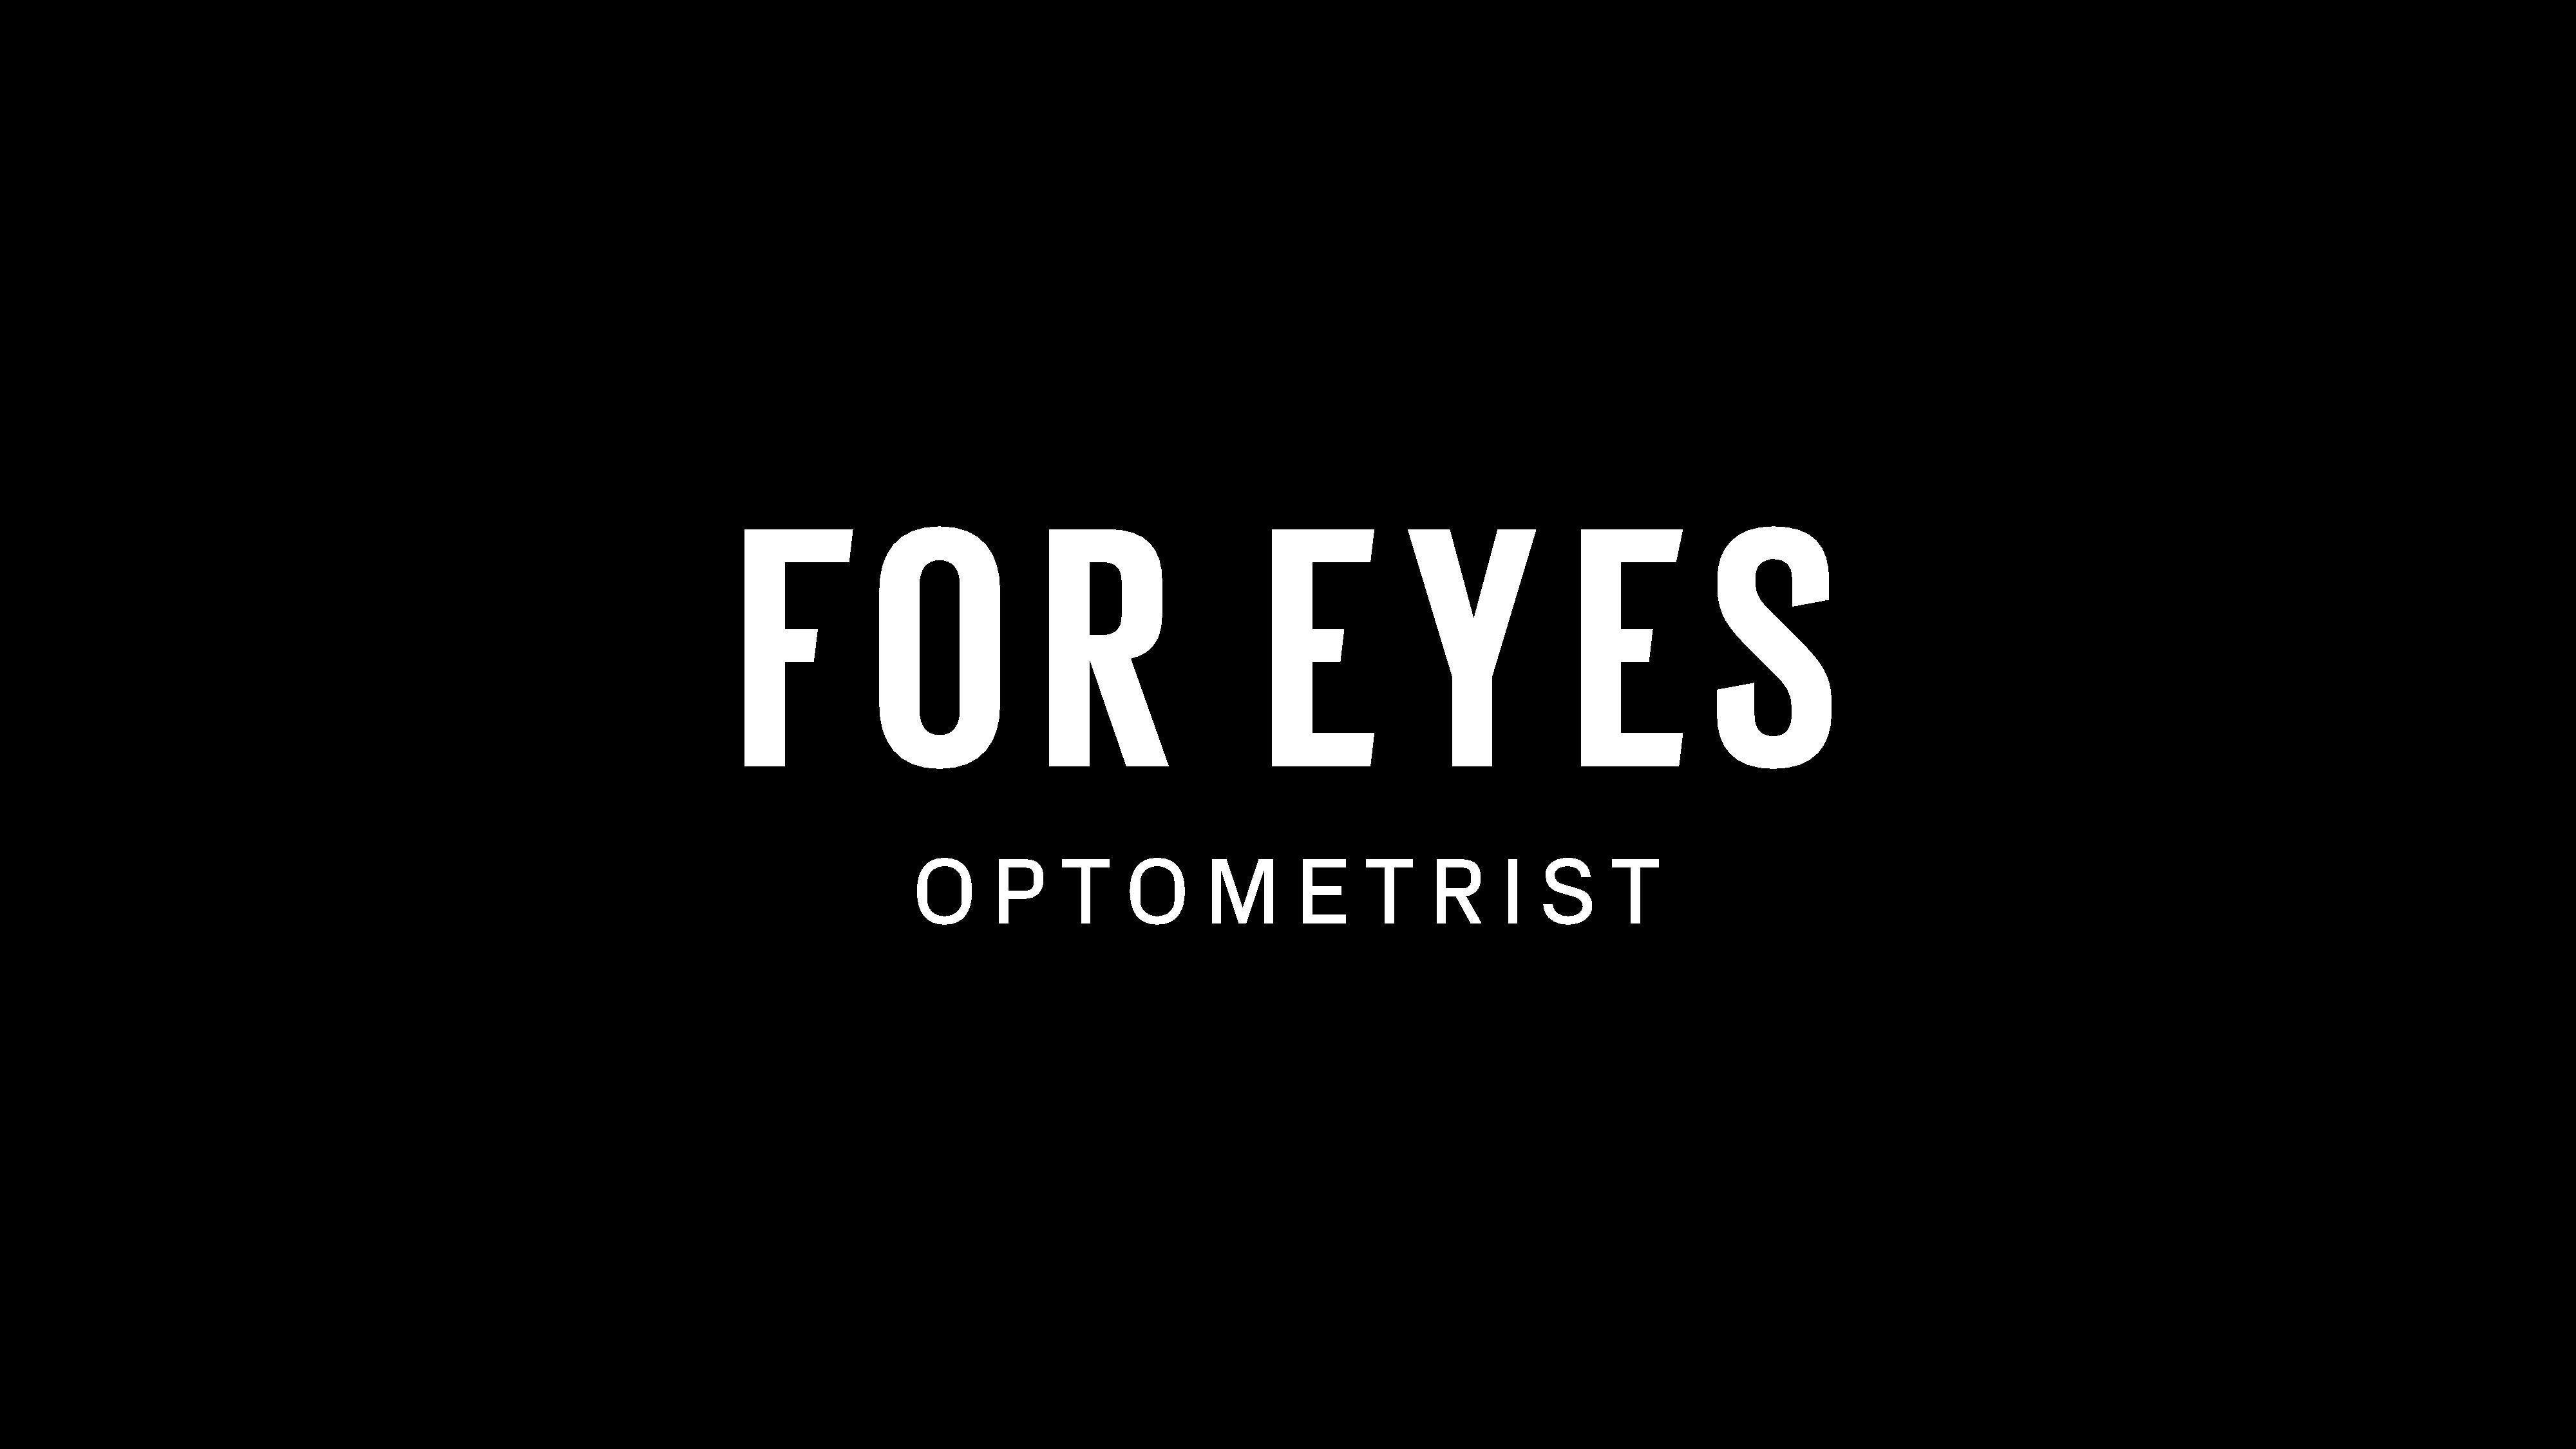 For Eyes Optometrist